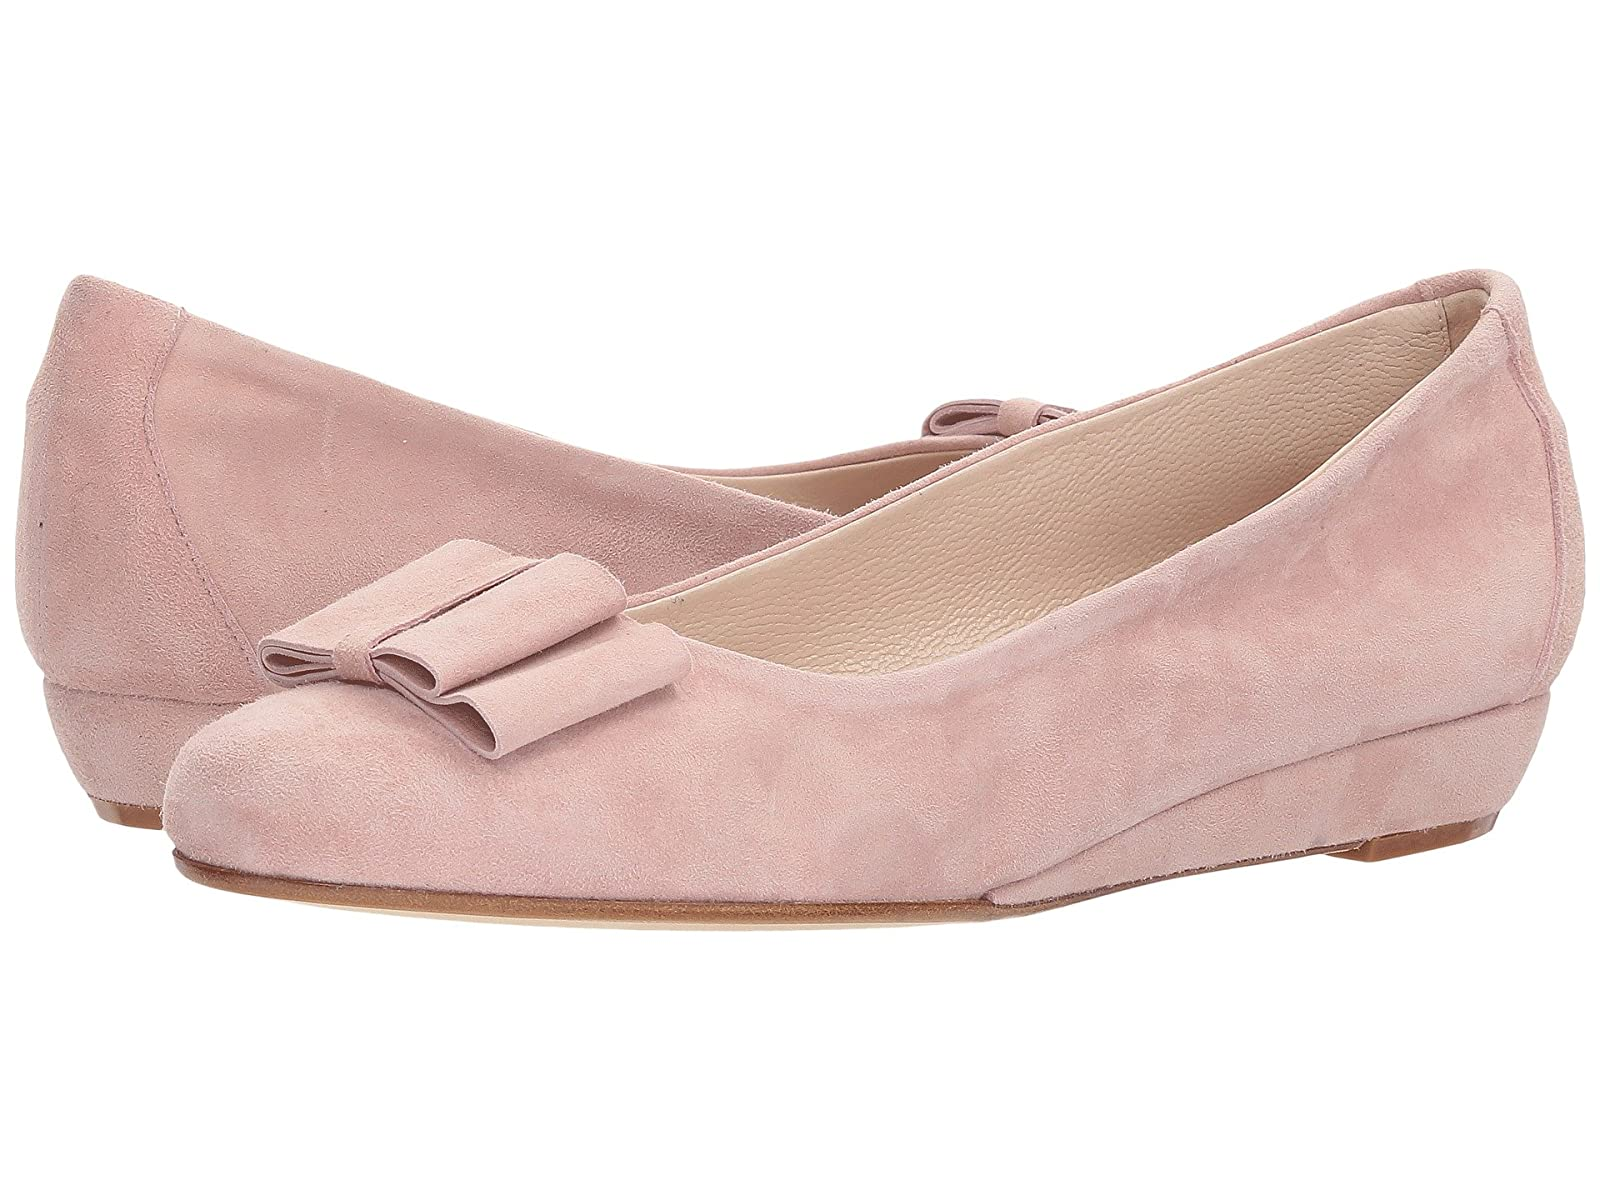 Cordani ArletteCheap and distinctive eye-catching shoes